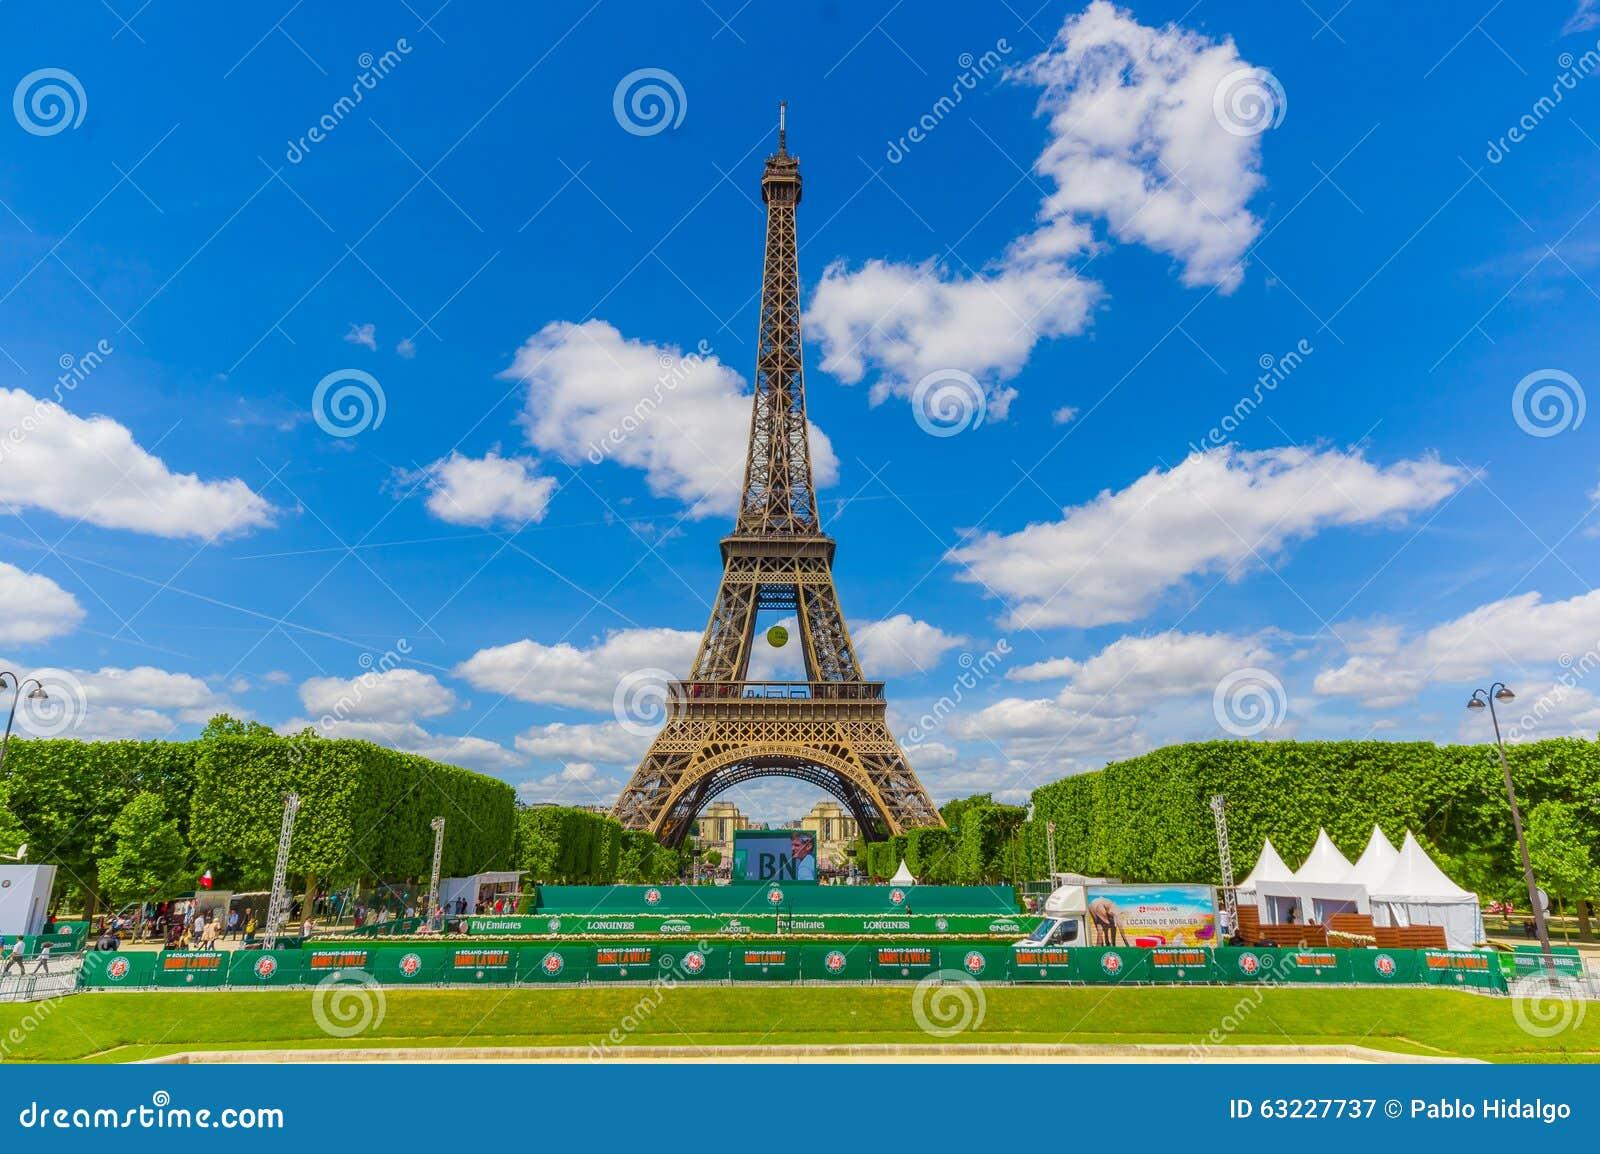 big view photography. big view photography beautiful summer of the eiffel towel in paris editorial s